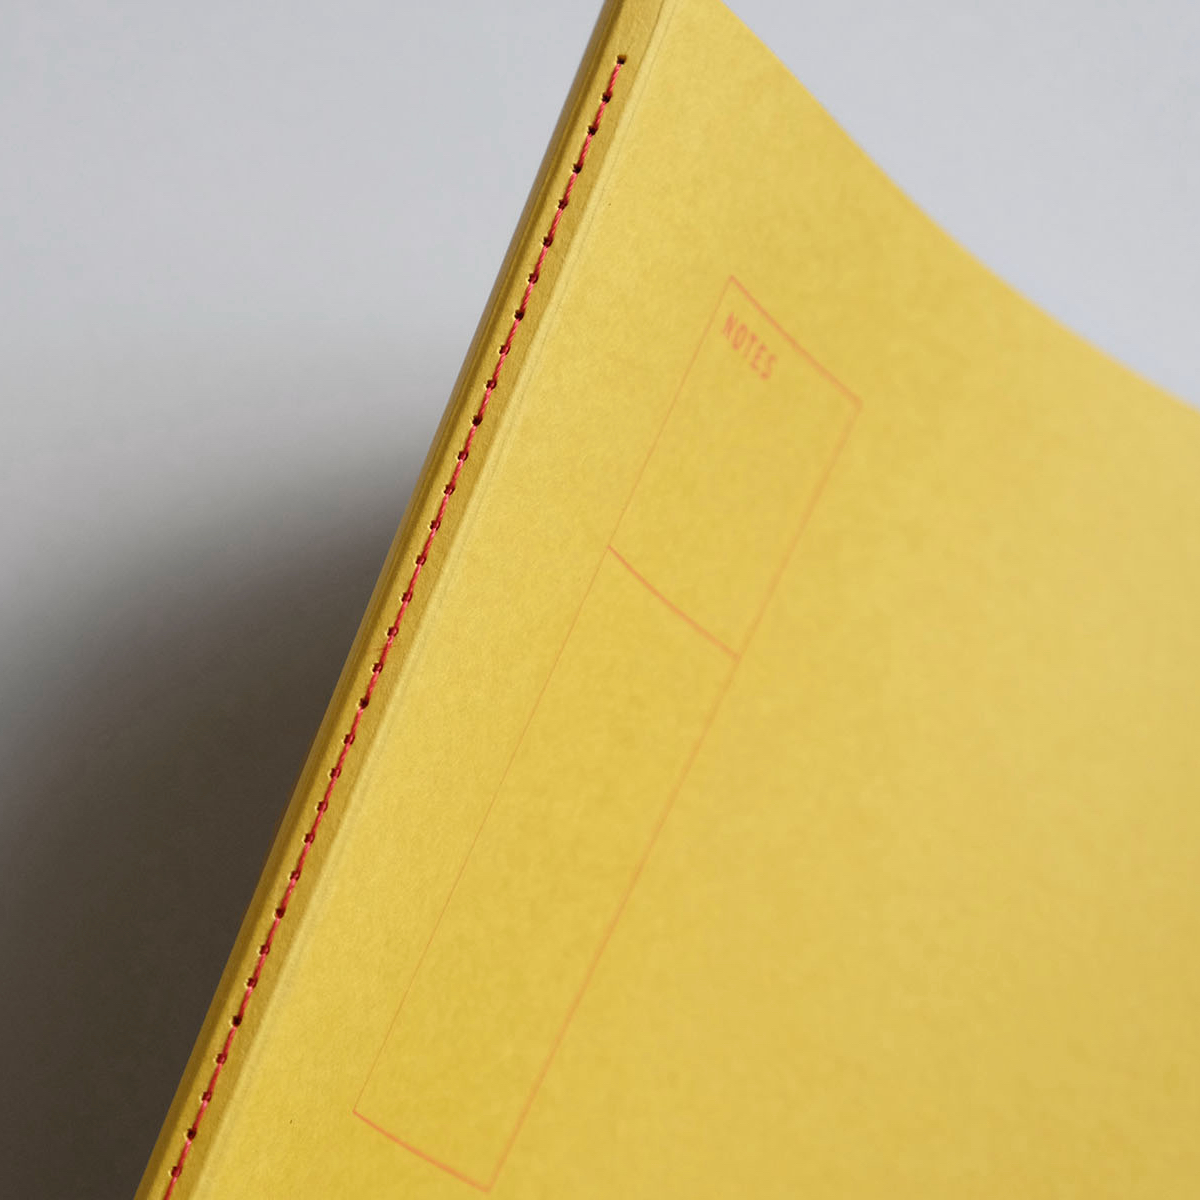 lekki_notebook_yellow_05